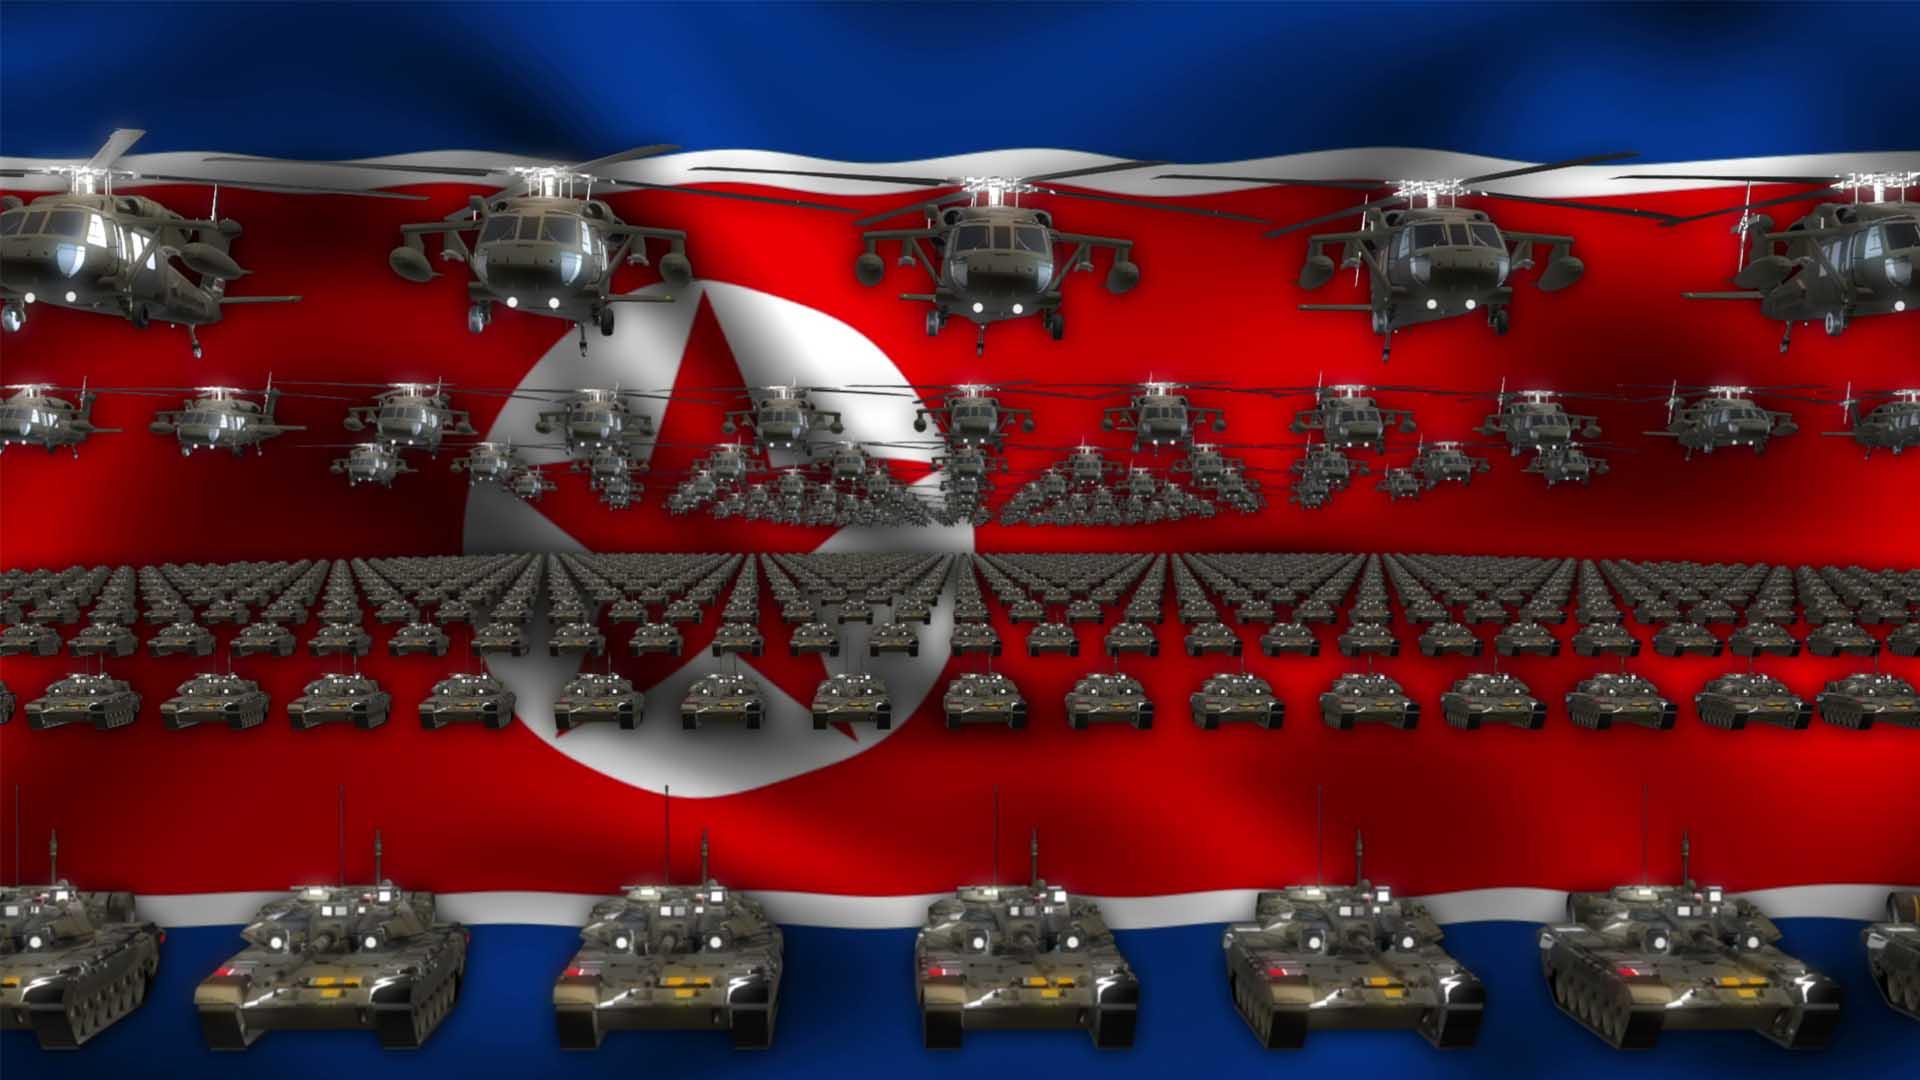 North Korea Iran video background vj loop